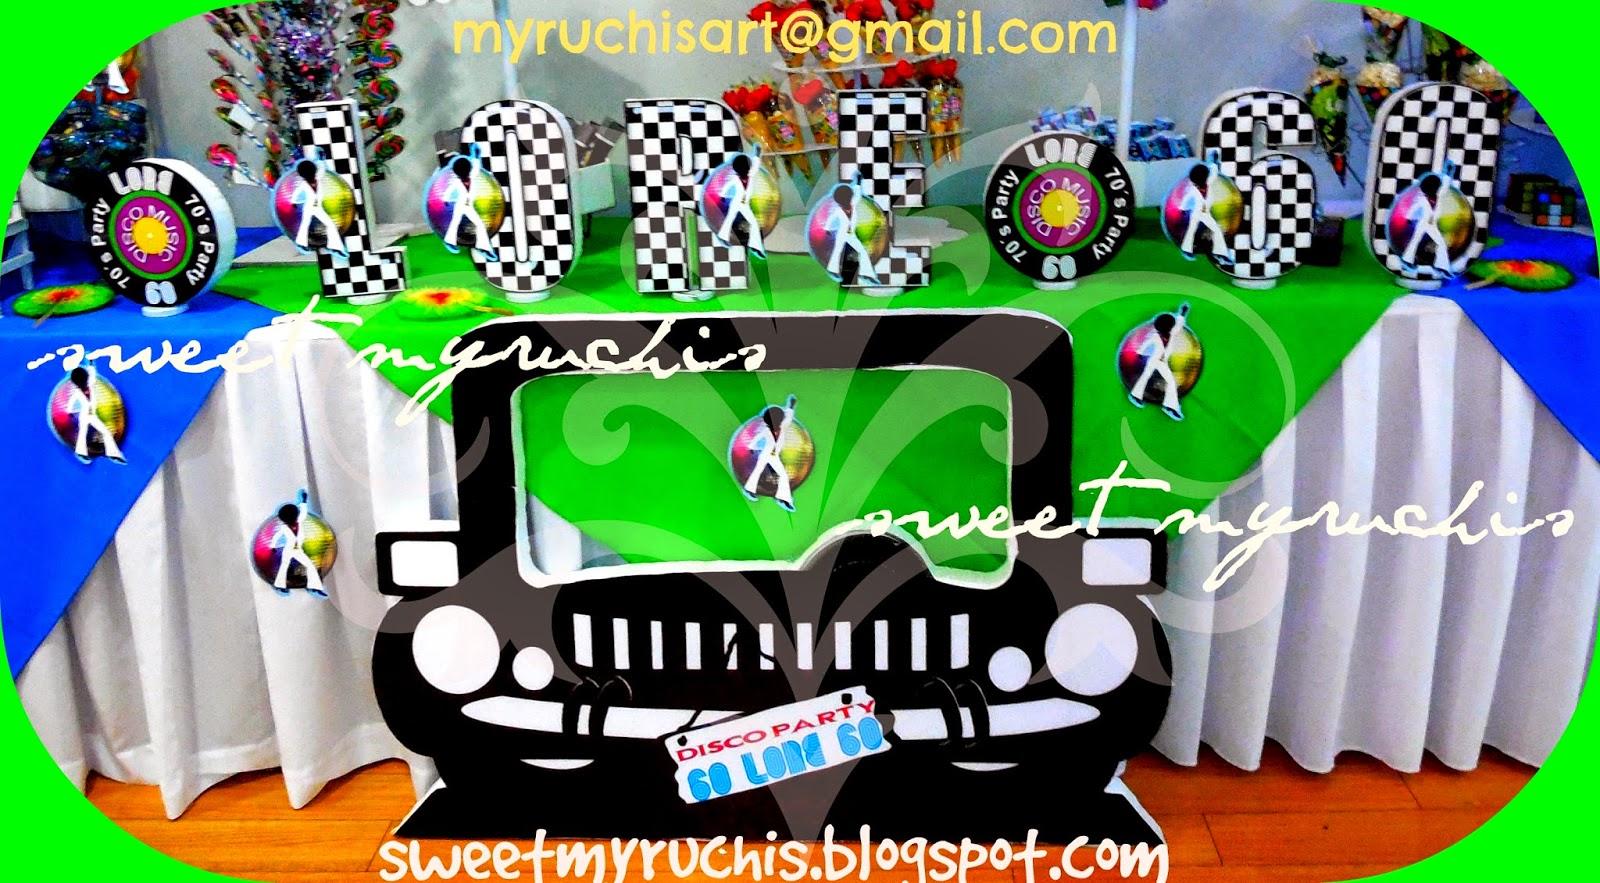 Decoraci n fiestas fiesta disco eventos sweet myruchis - Ideas para discotecas ...